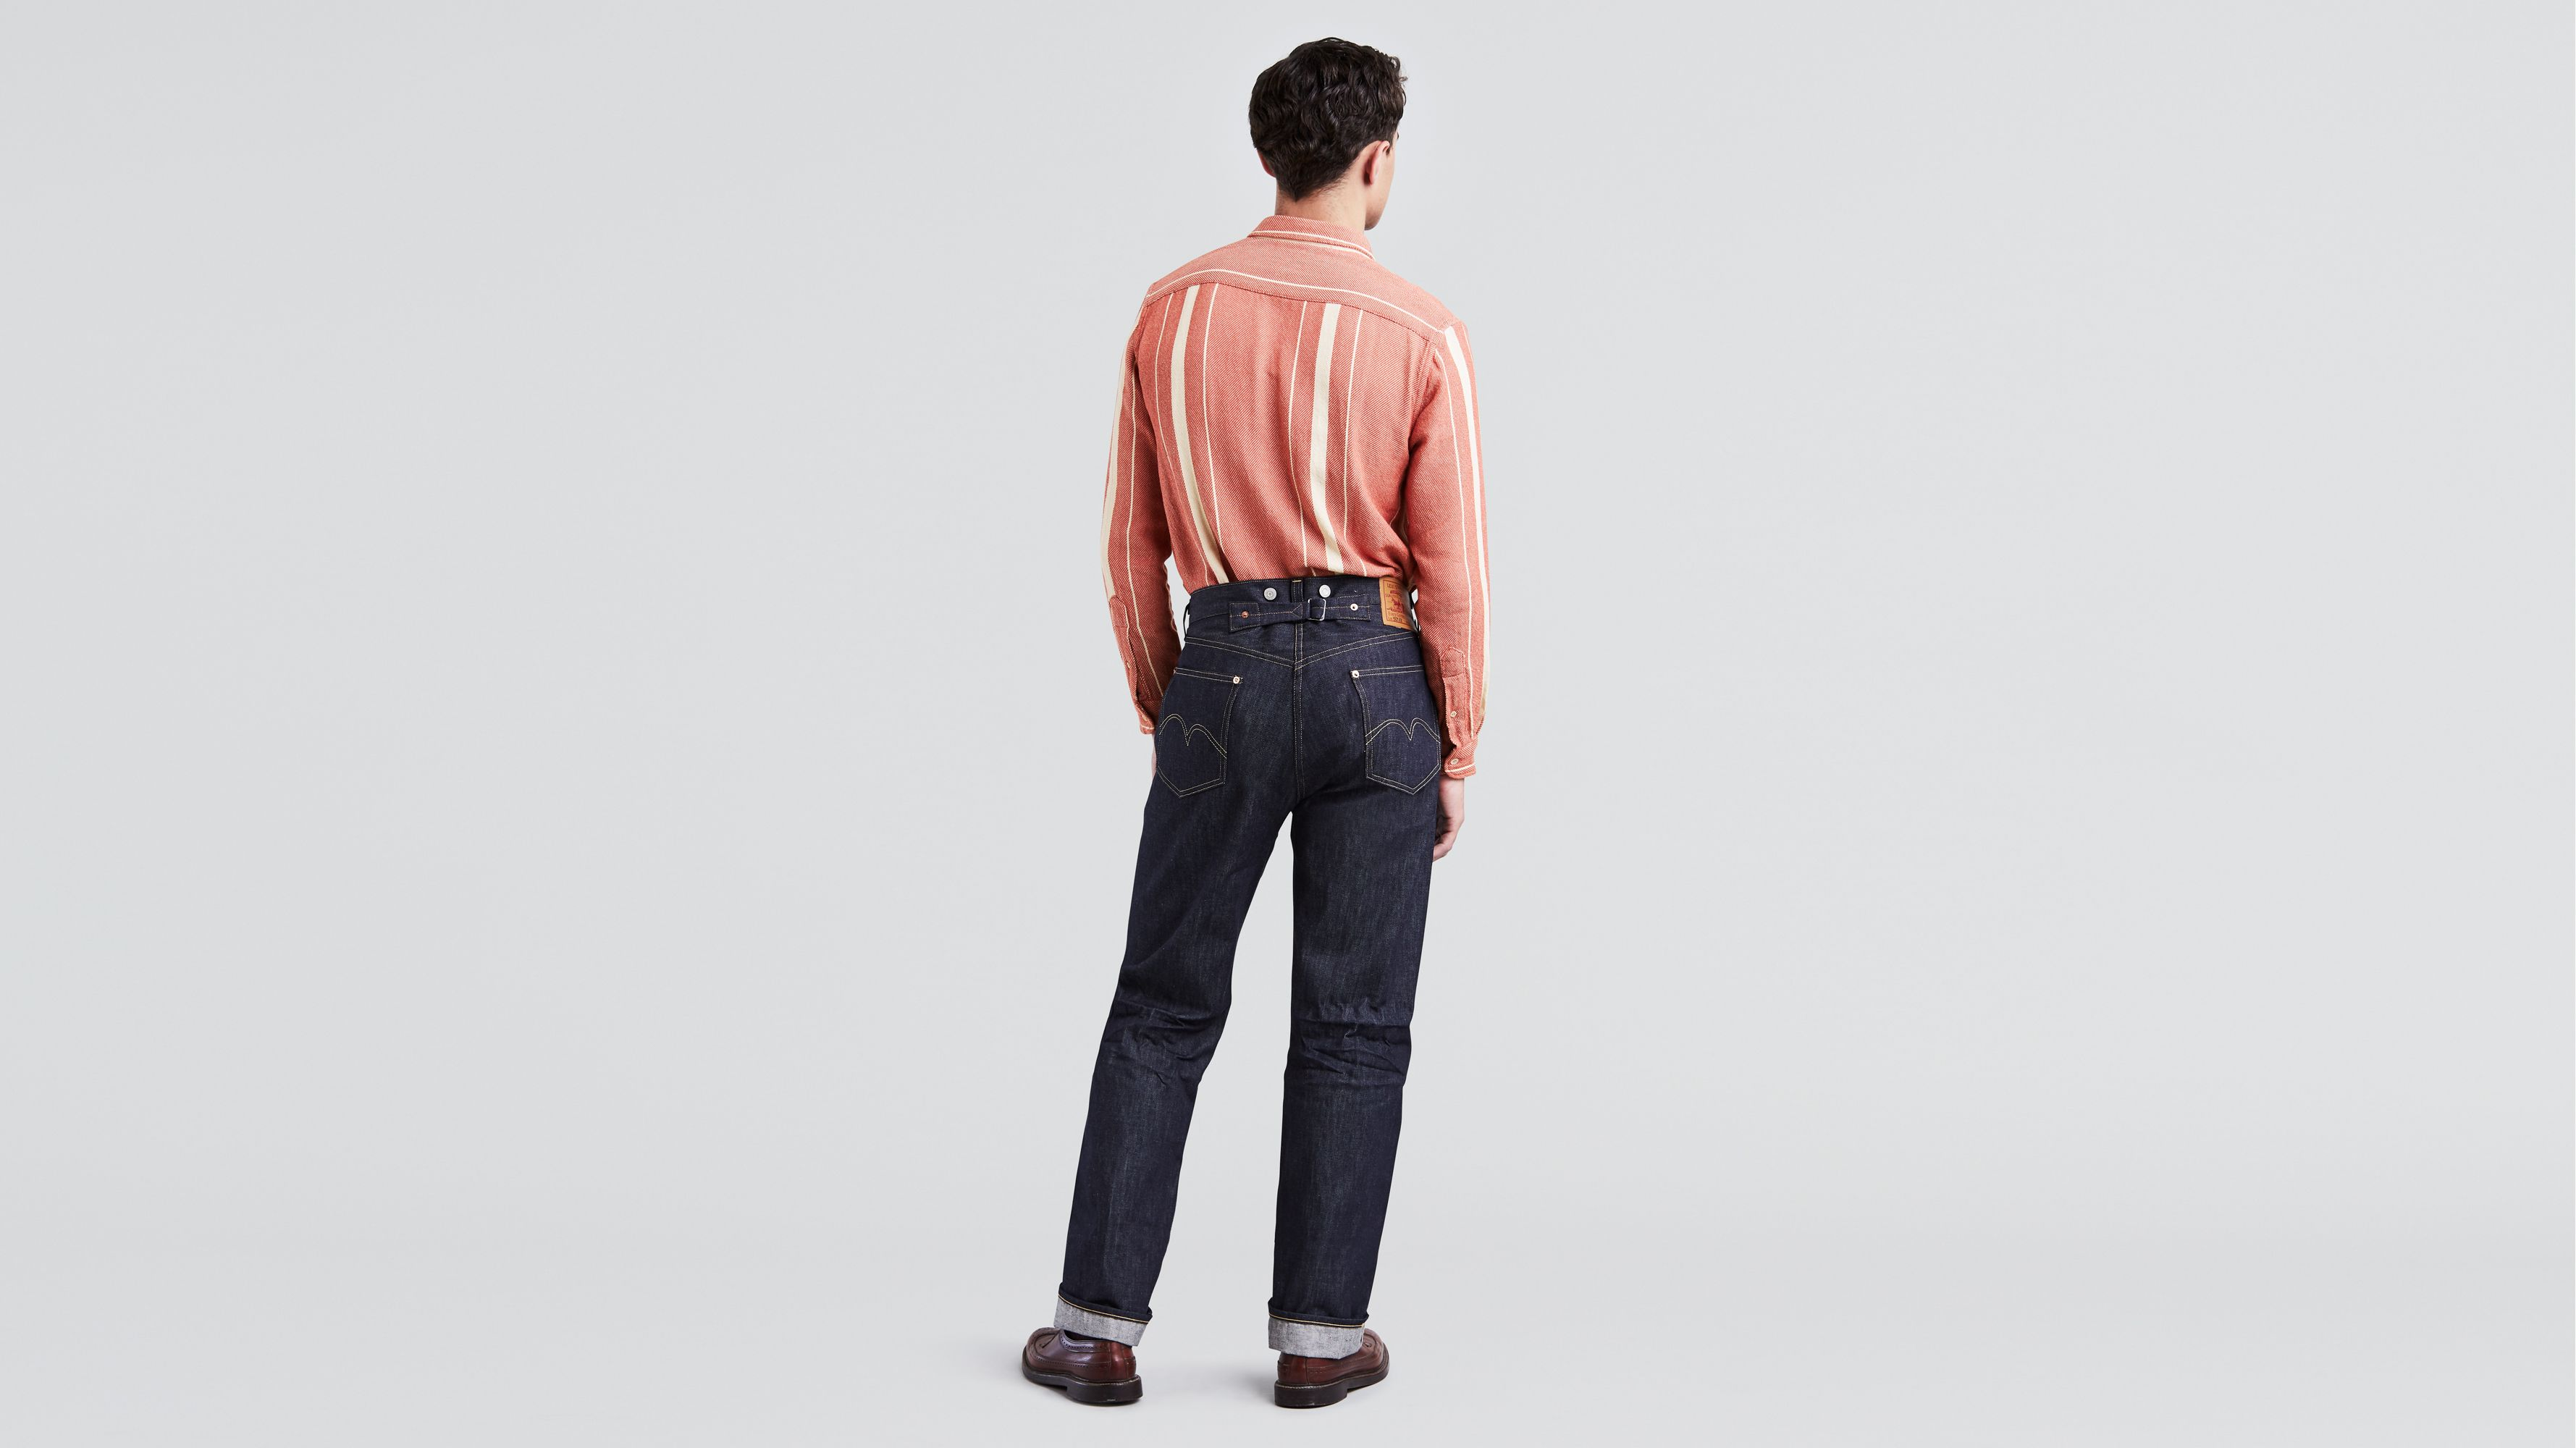 6e15a8c9 Levi's® Vintage Clothing 1933 501® Jeans - Dark Wash | Levi's® GB